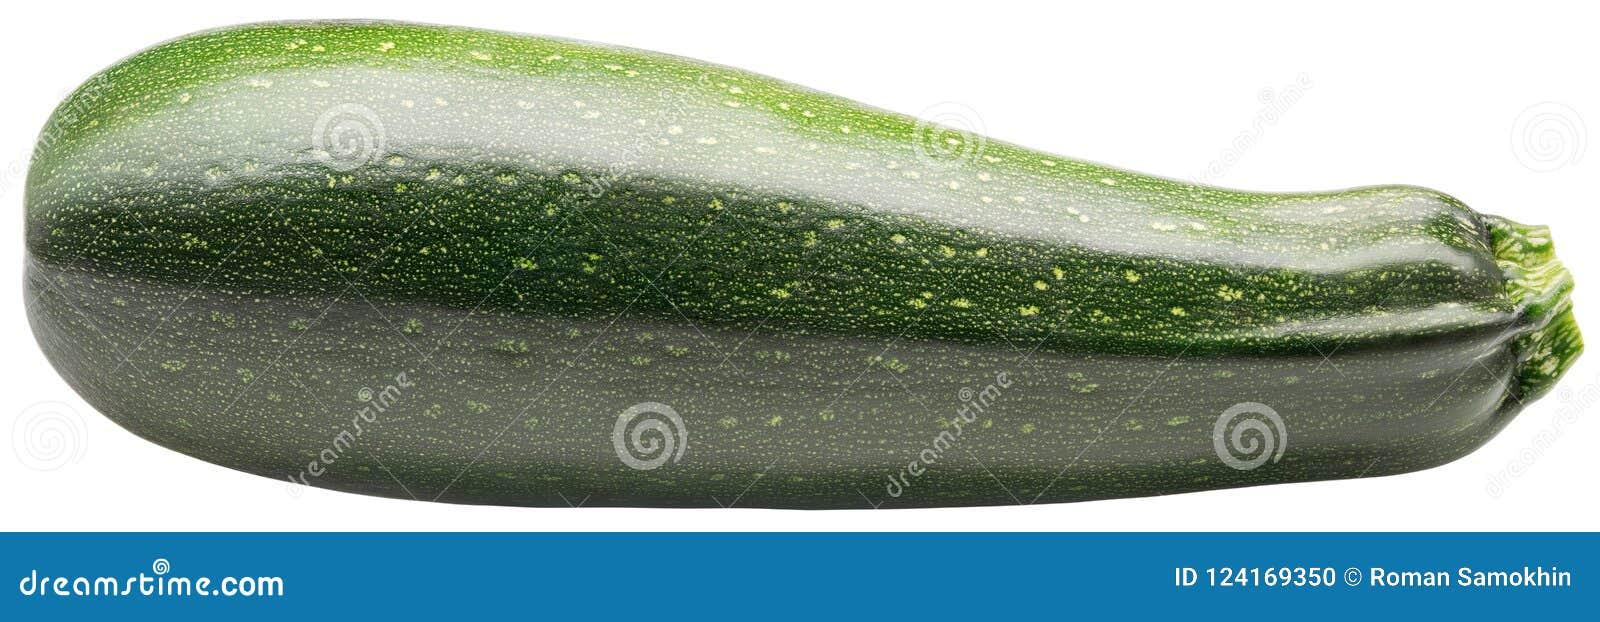 Solated zucchini Två zucchini eller zucchinier som isoleras på vit